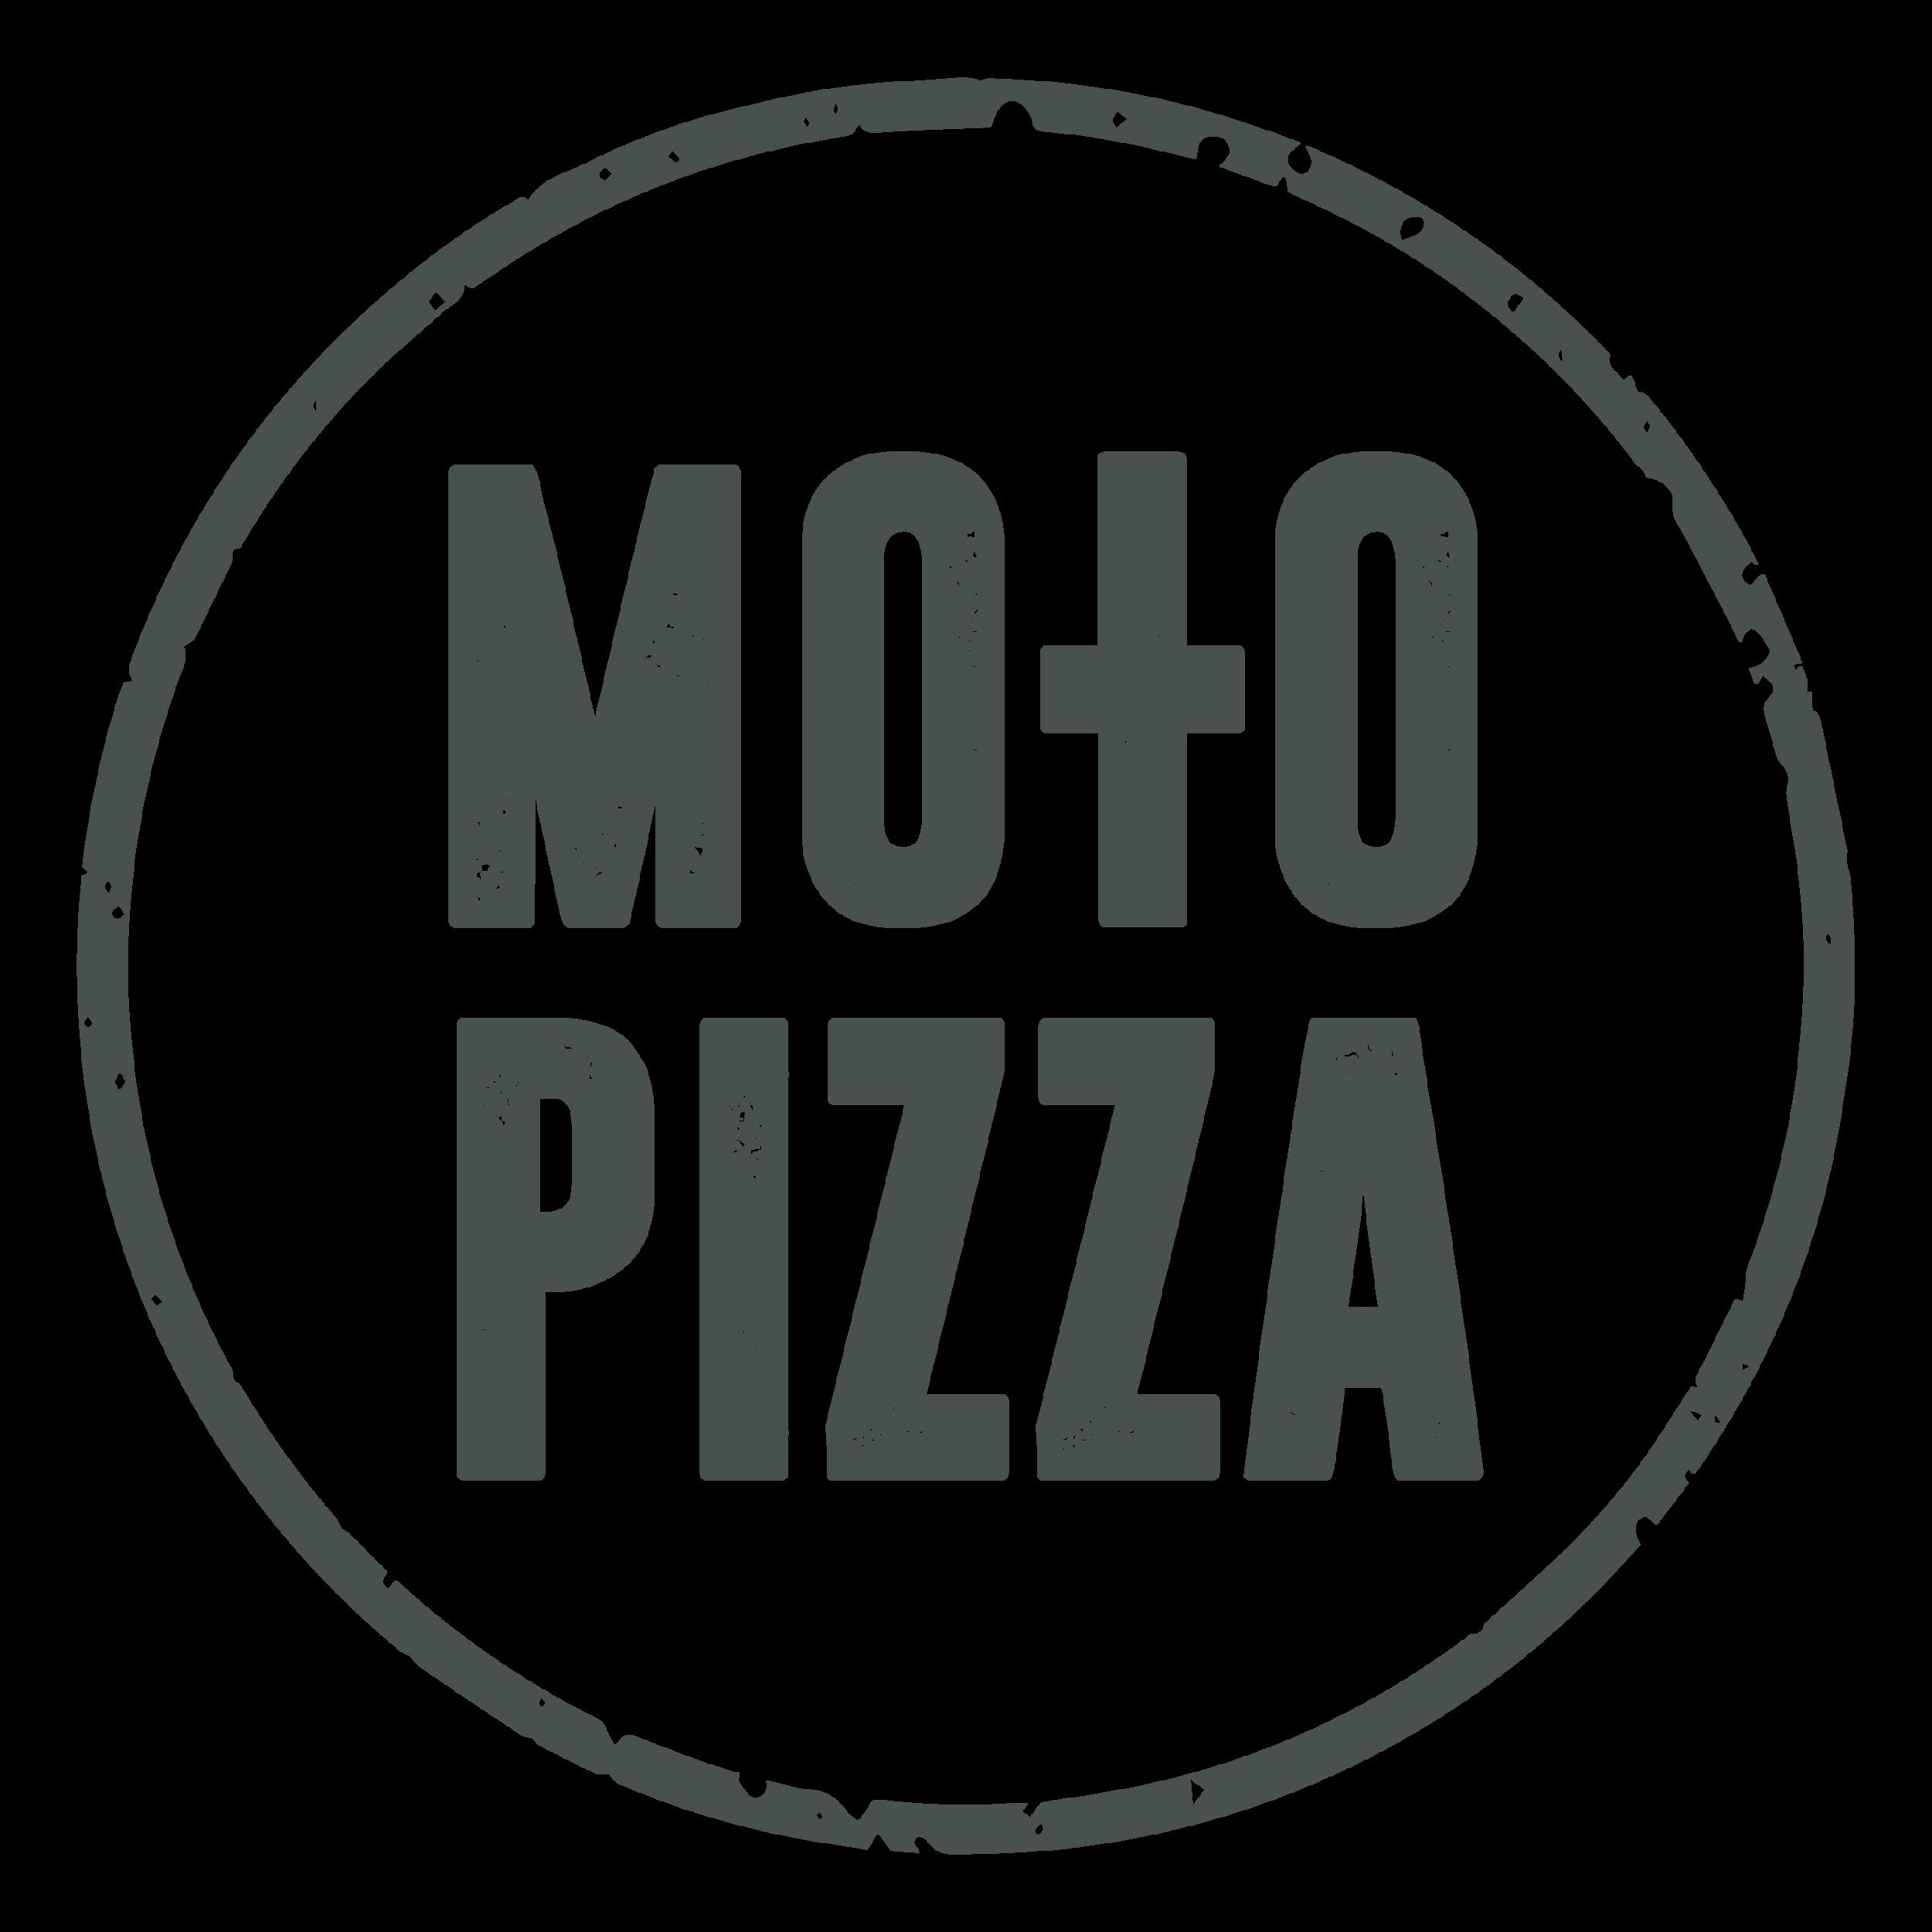 Moto Pizza Logo